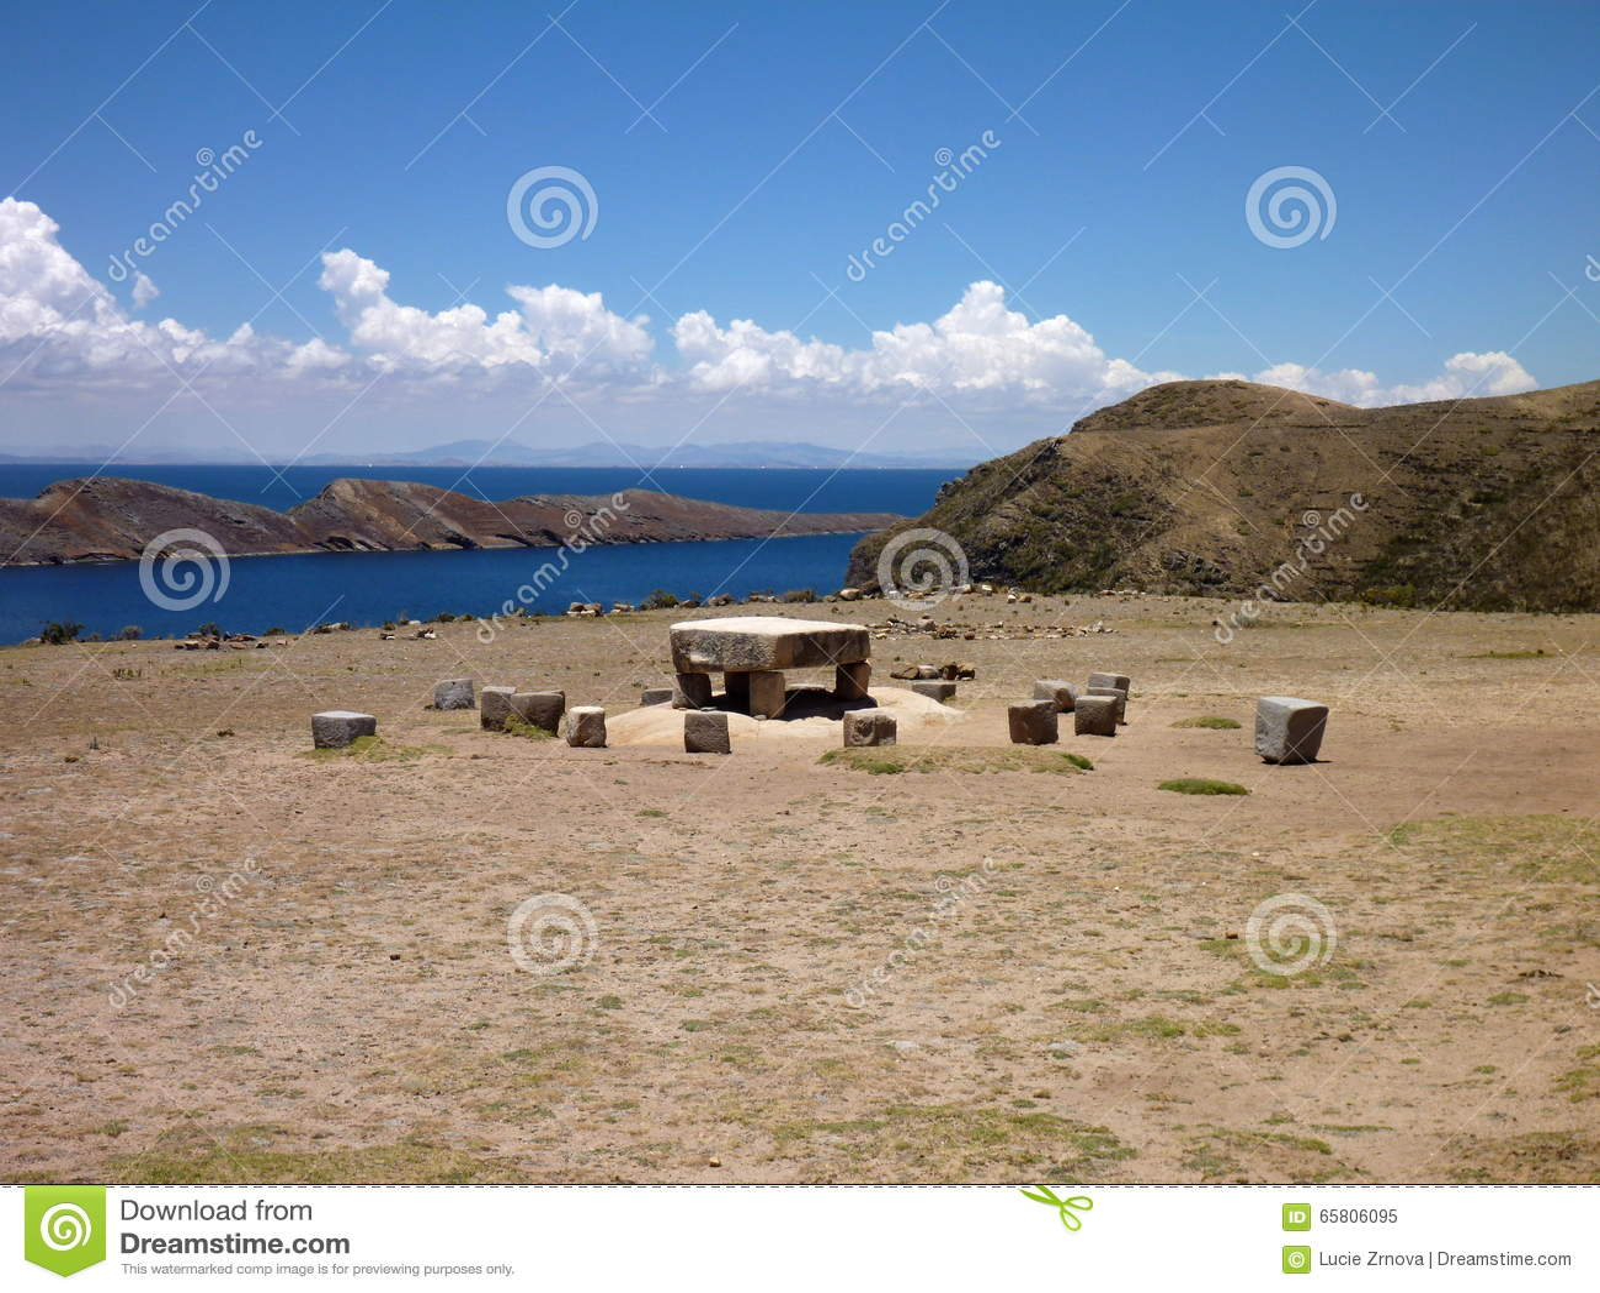 Mesa εθιμοτυπικό isla del sol στο titicaca lago